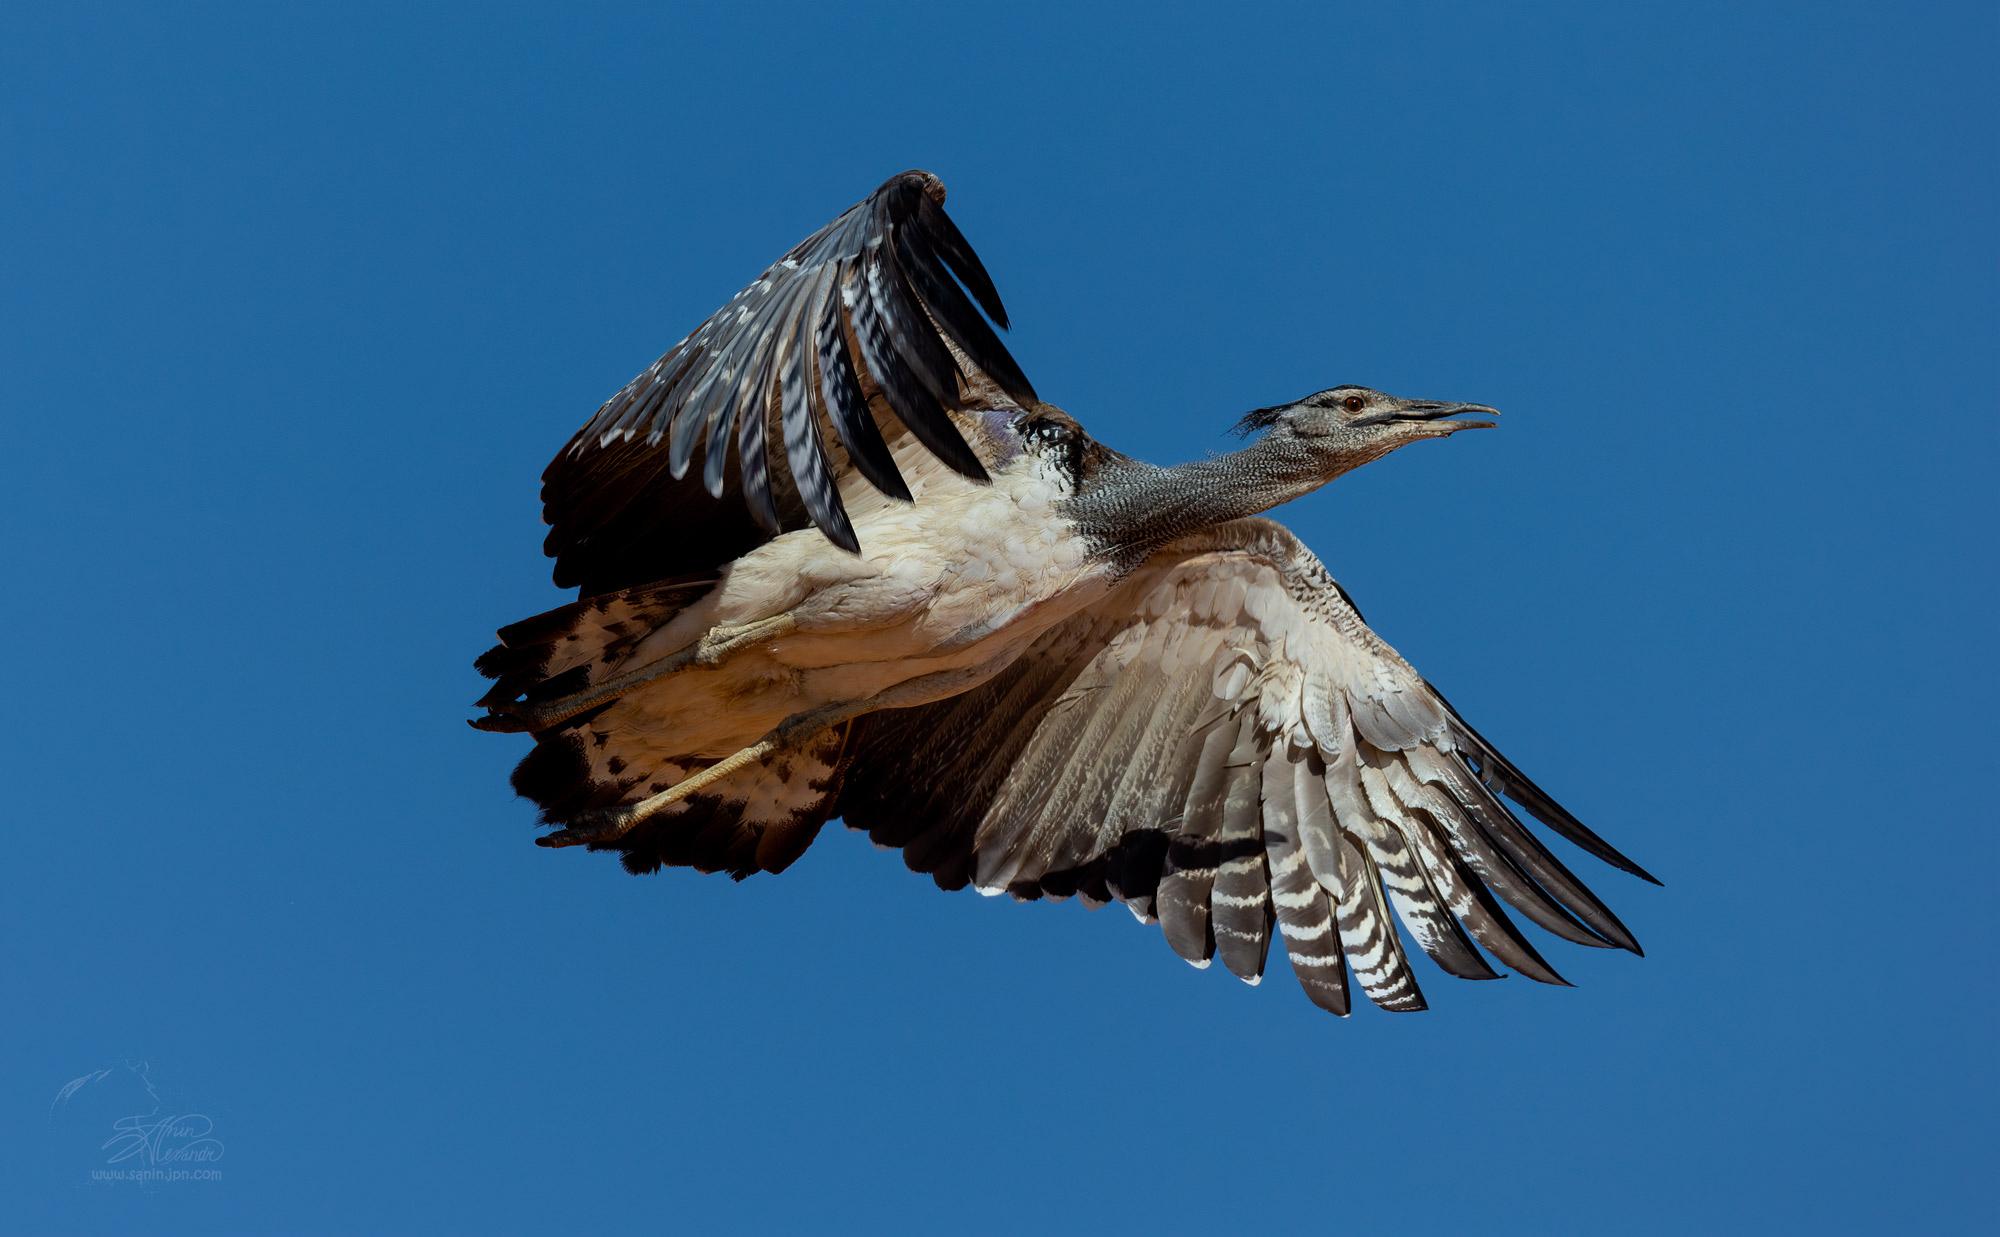 Kori bustard in flight